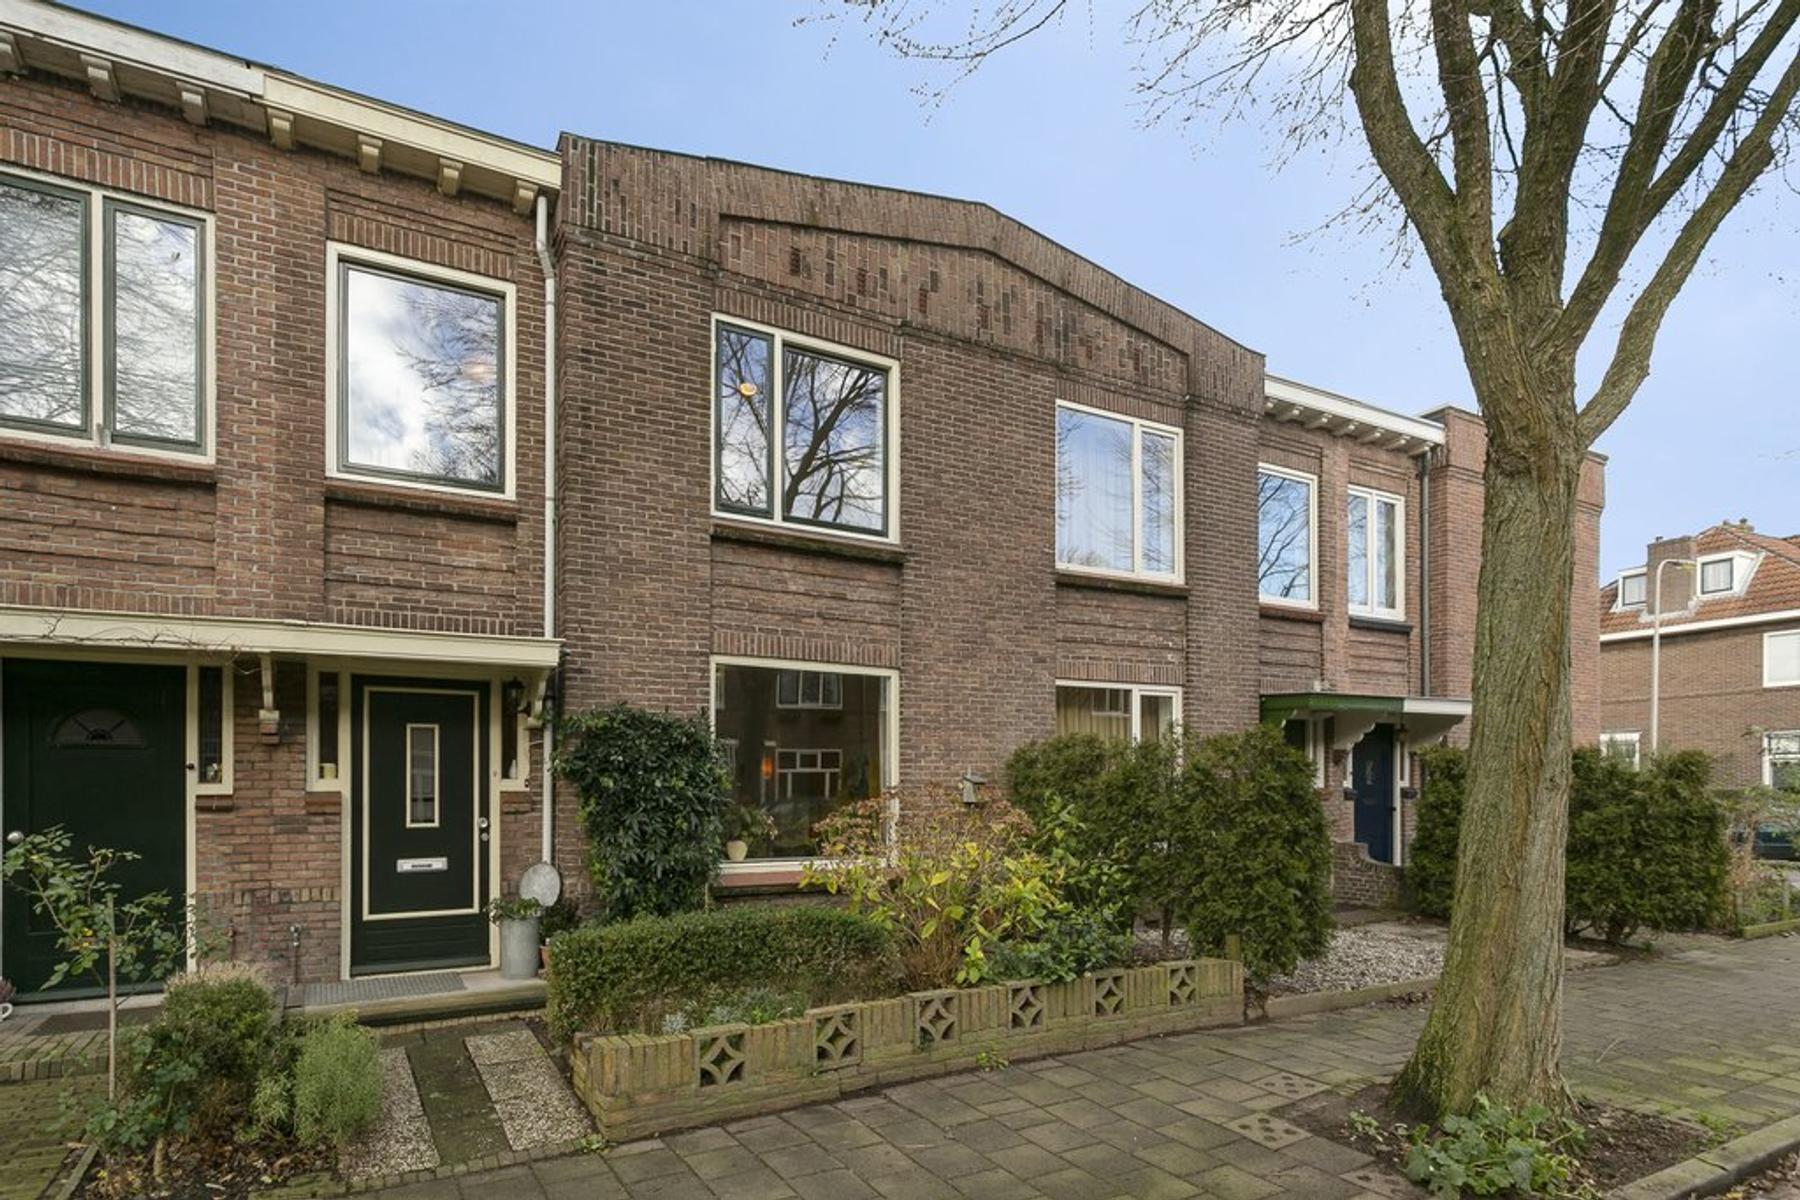 J.P. Sweelinckstraat 24 in Deventer 7412 DW